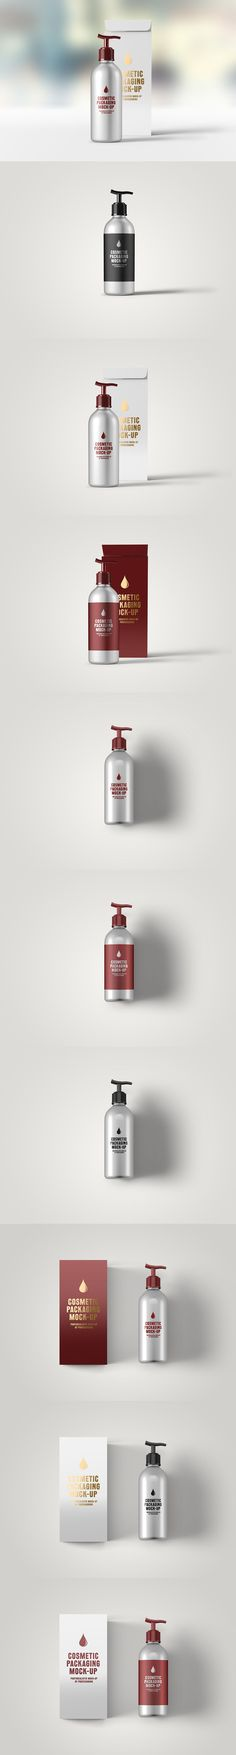 Cosmetic Packaging Mock-Up